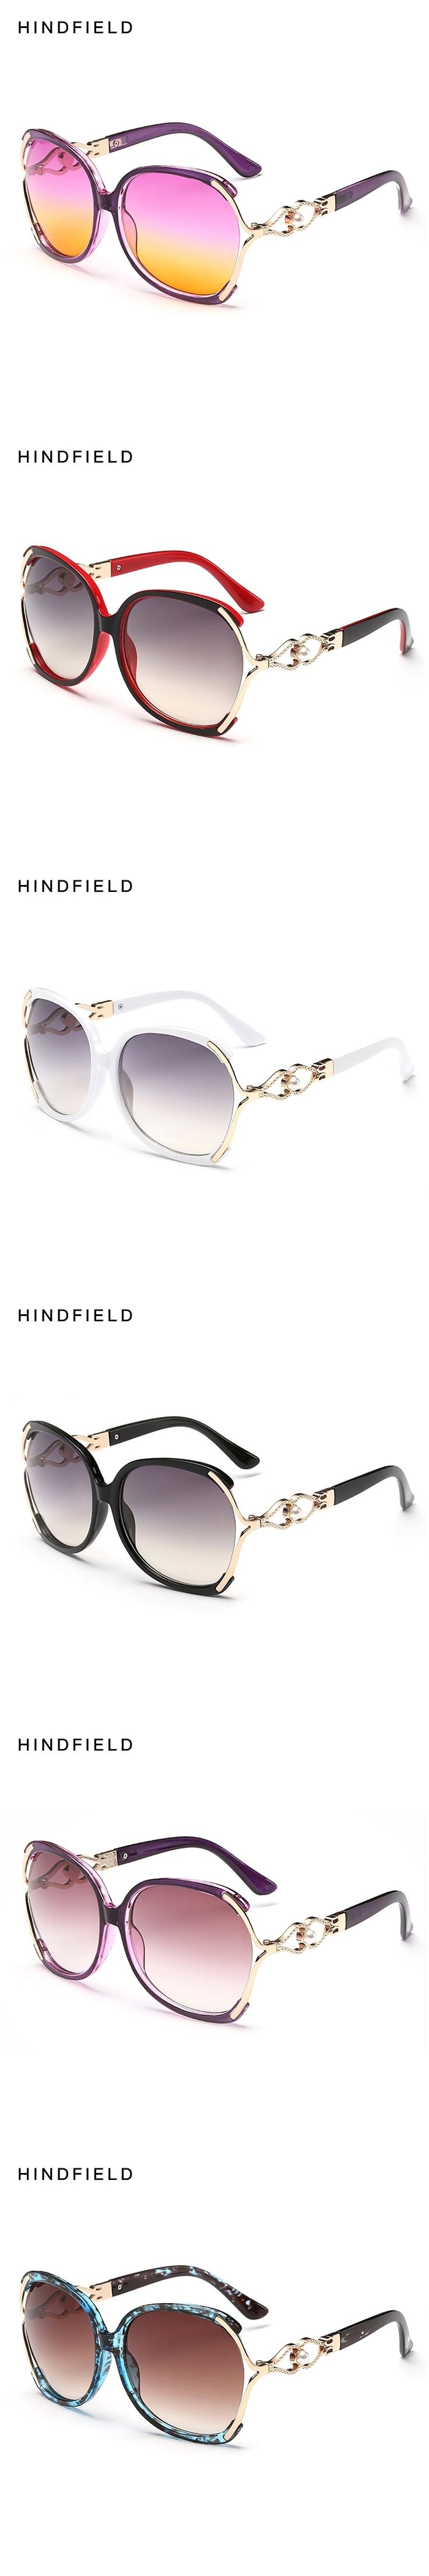 2017 Women Polarized Sunglasses Retro Big Round PC Frame Brand Design Black Sun Glasses Luxury Ladies Driving gafas de sol mujer